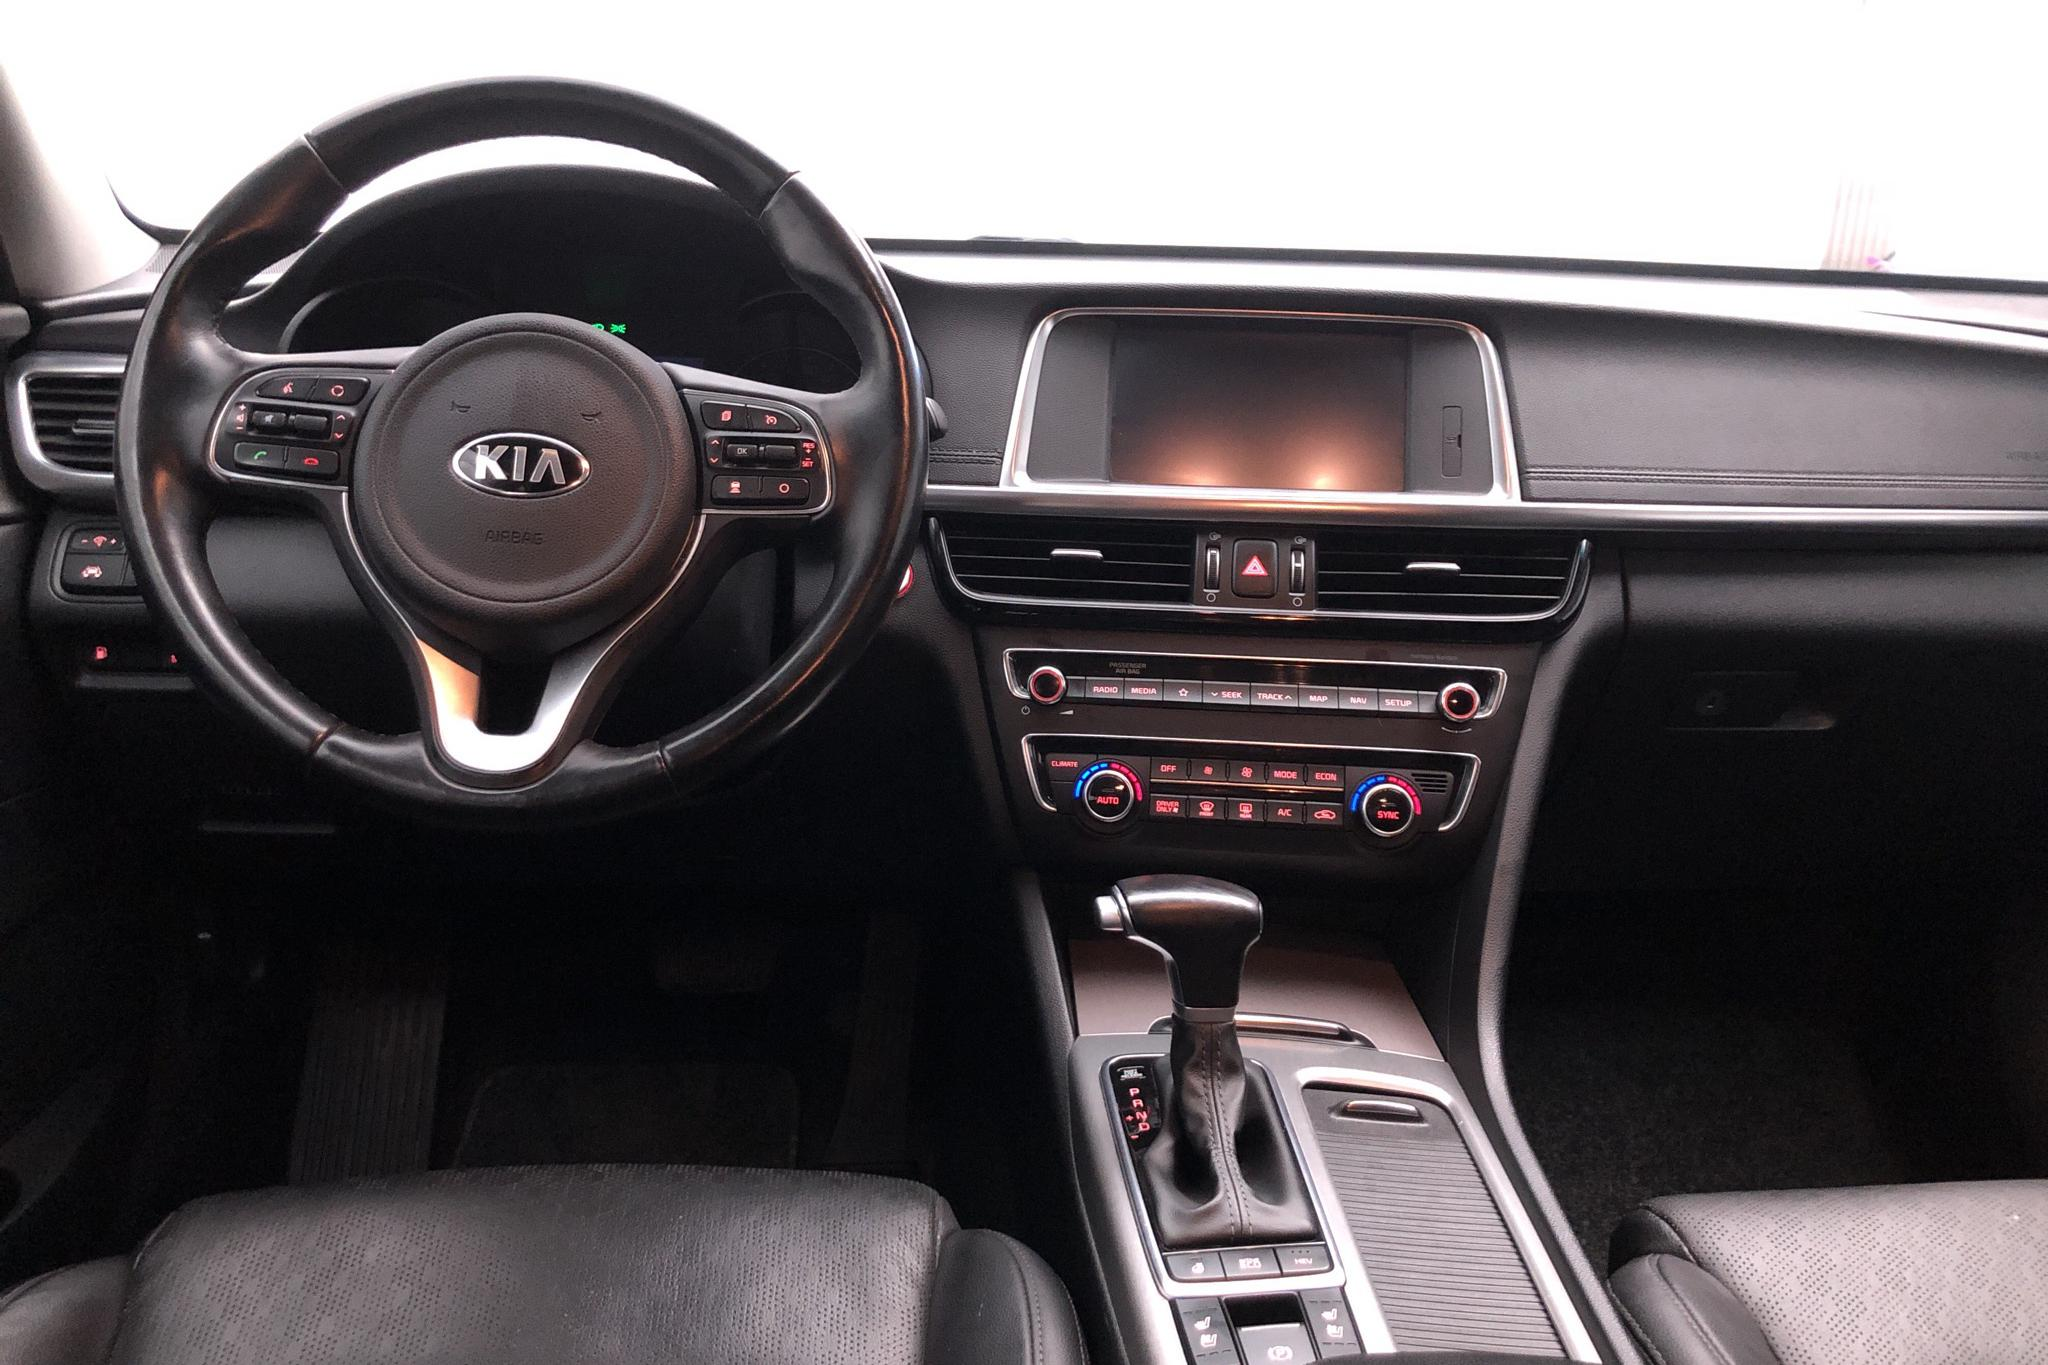 KIA Optima 2.0 GDi Plug-in Hybrid SW (205hk) - 11 881 mil - Automat - svart - 2018